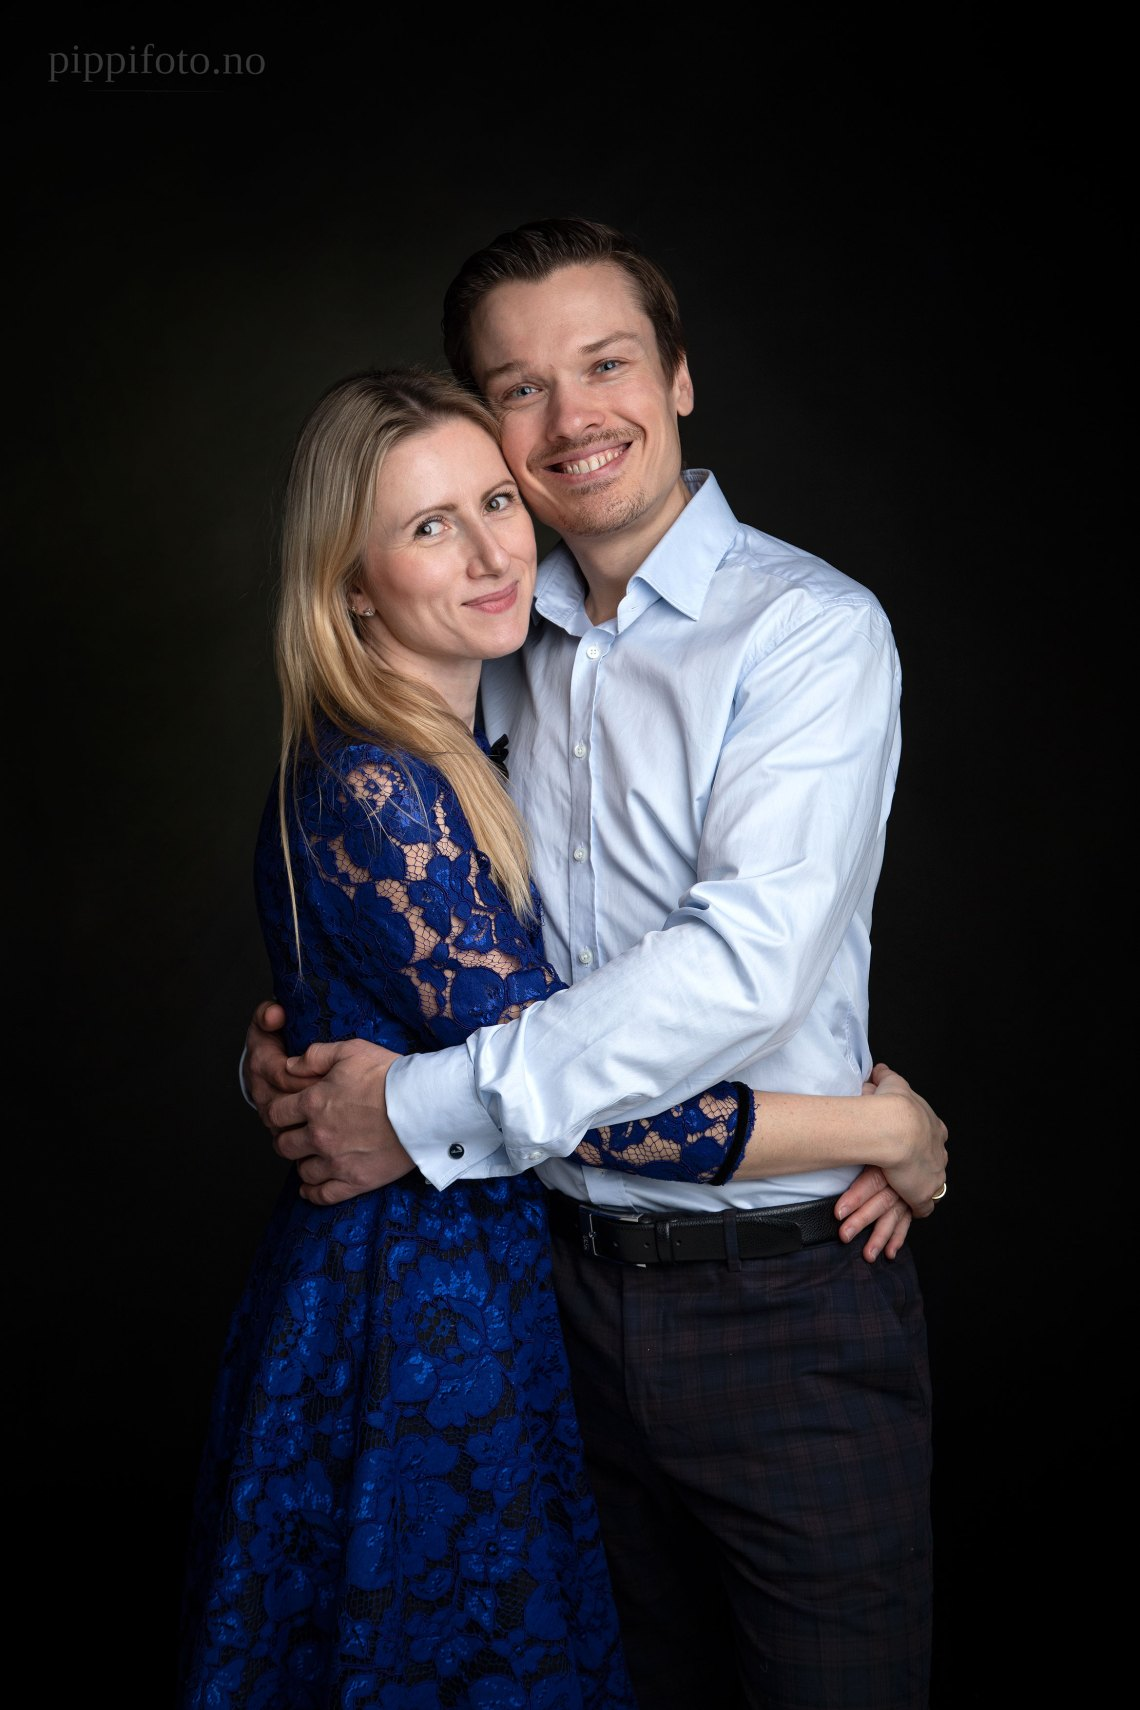 familiefotografering-kjærestefotografering-fotograf-Oslo-Akershus